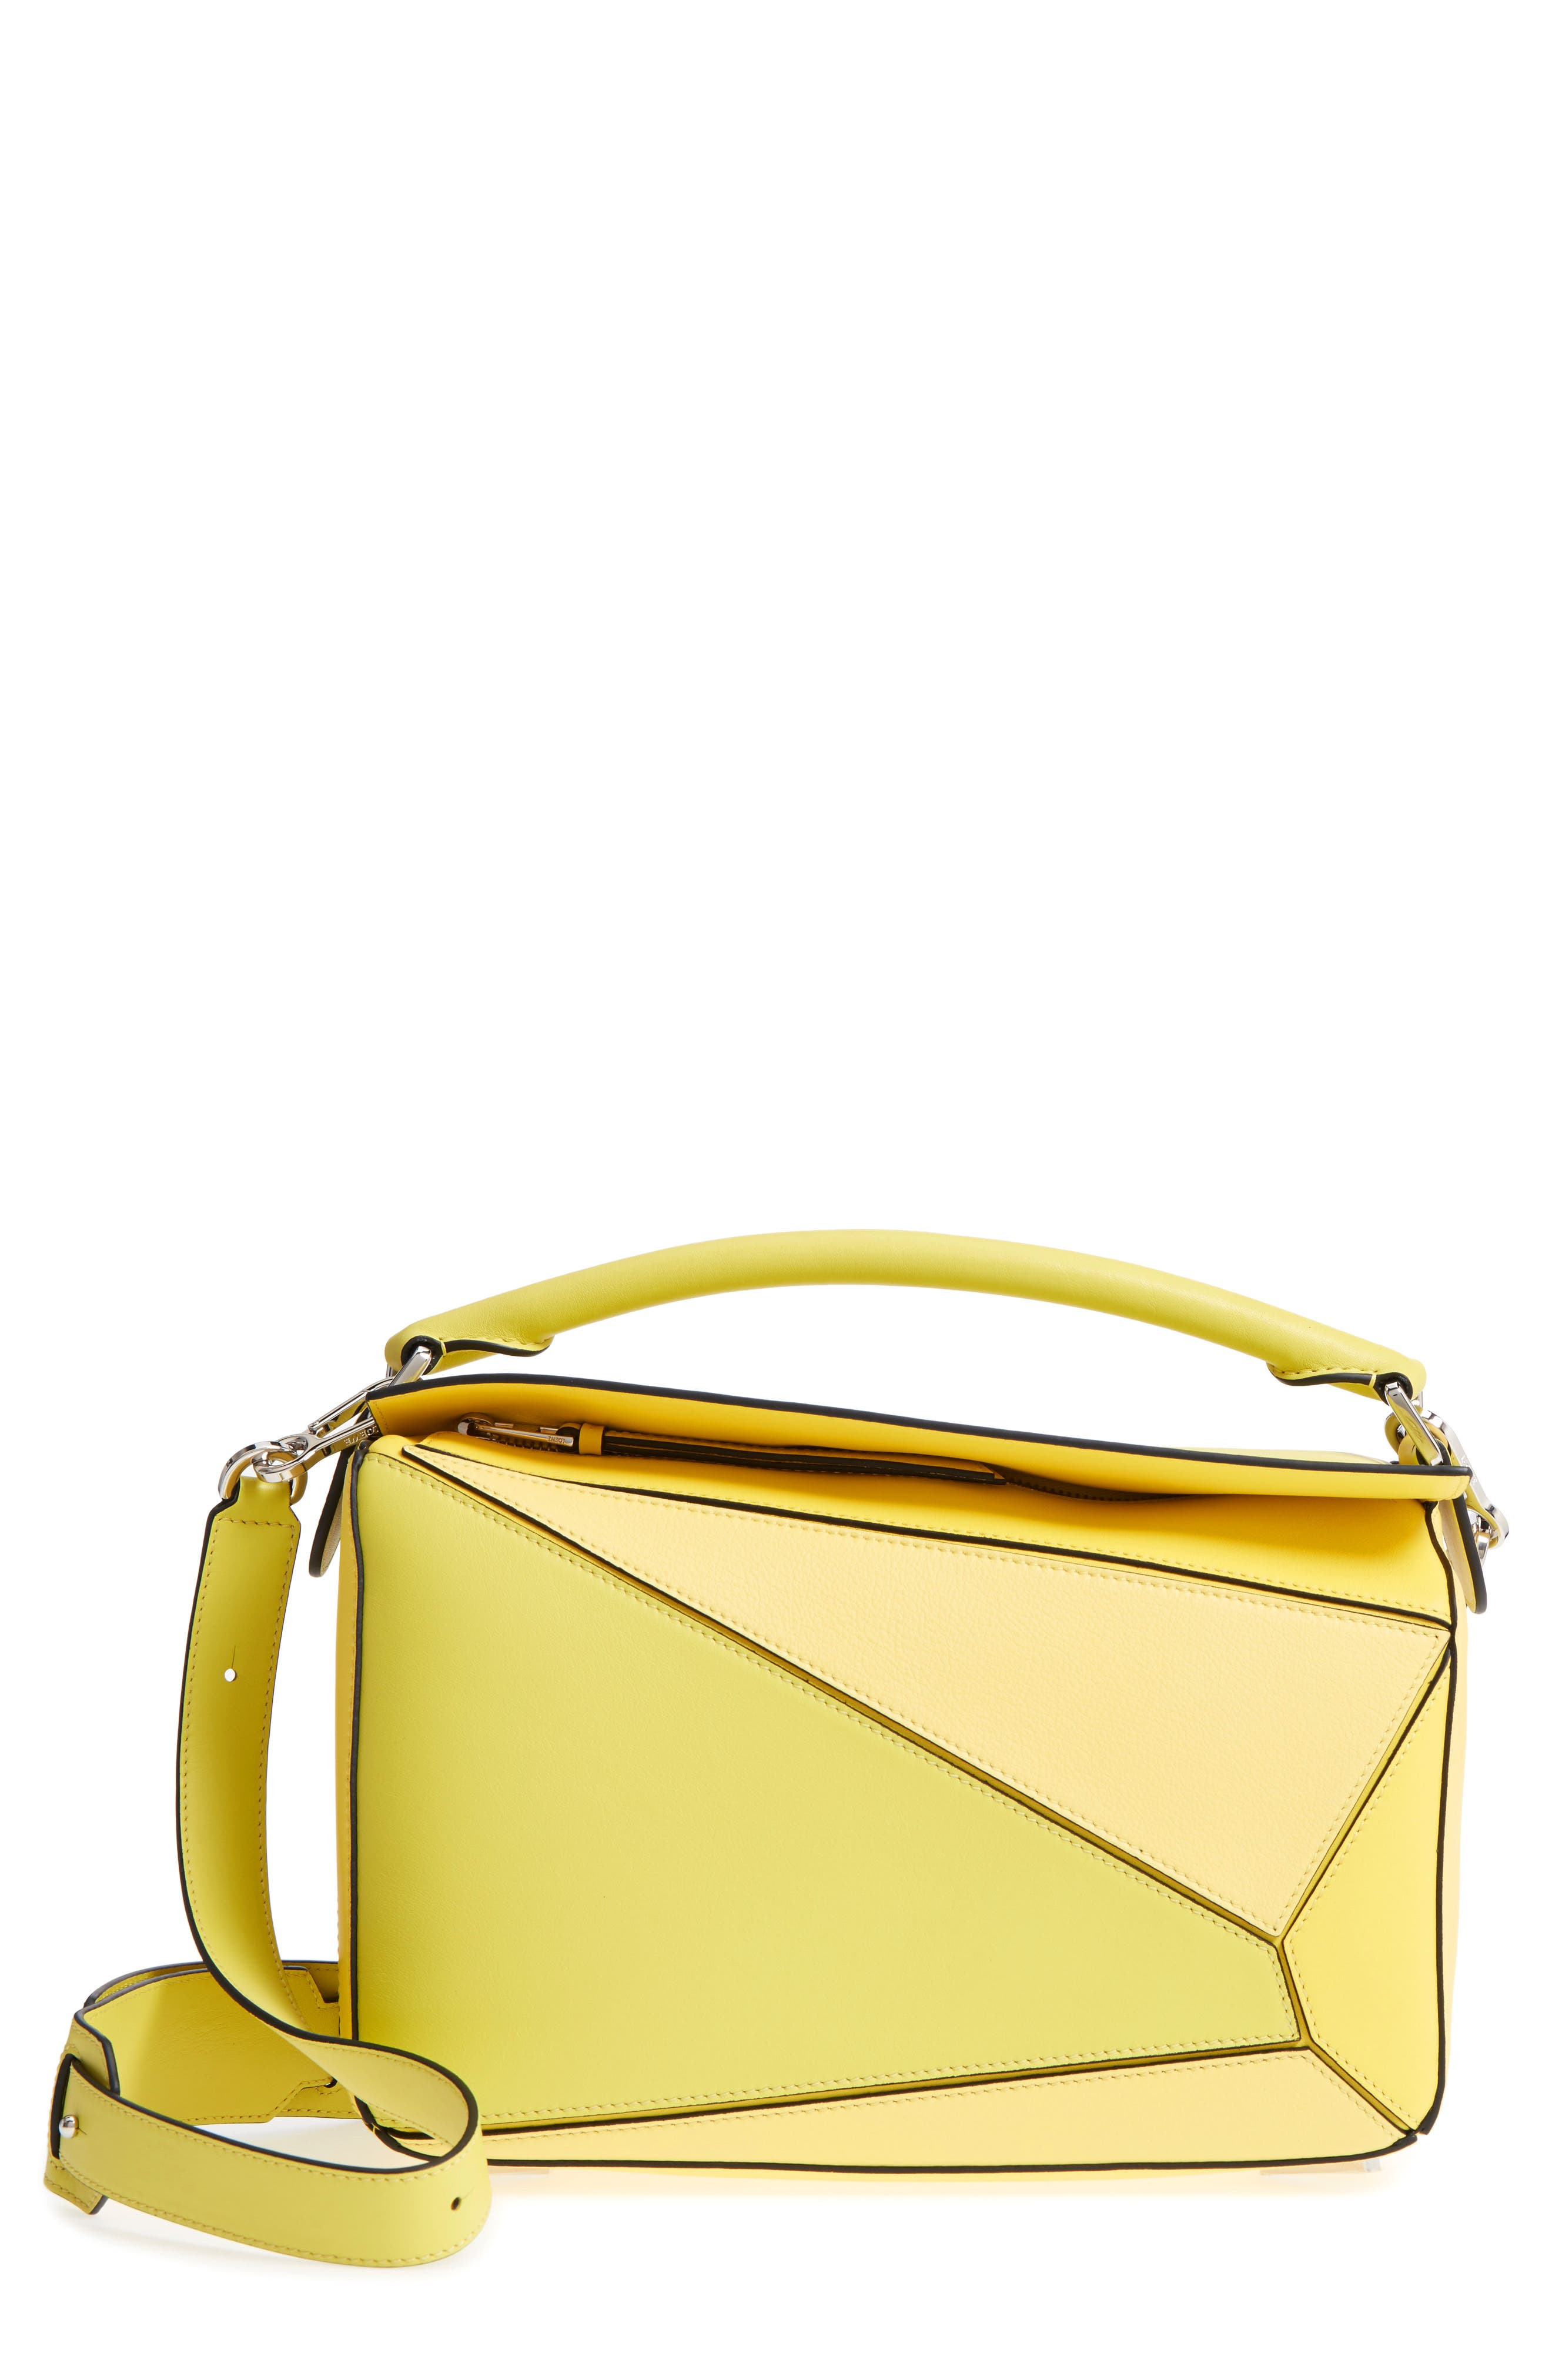 Loewe Medium Puzzle Calfskin Leather Shoulder Bag